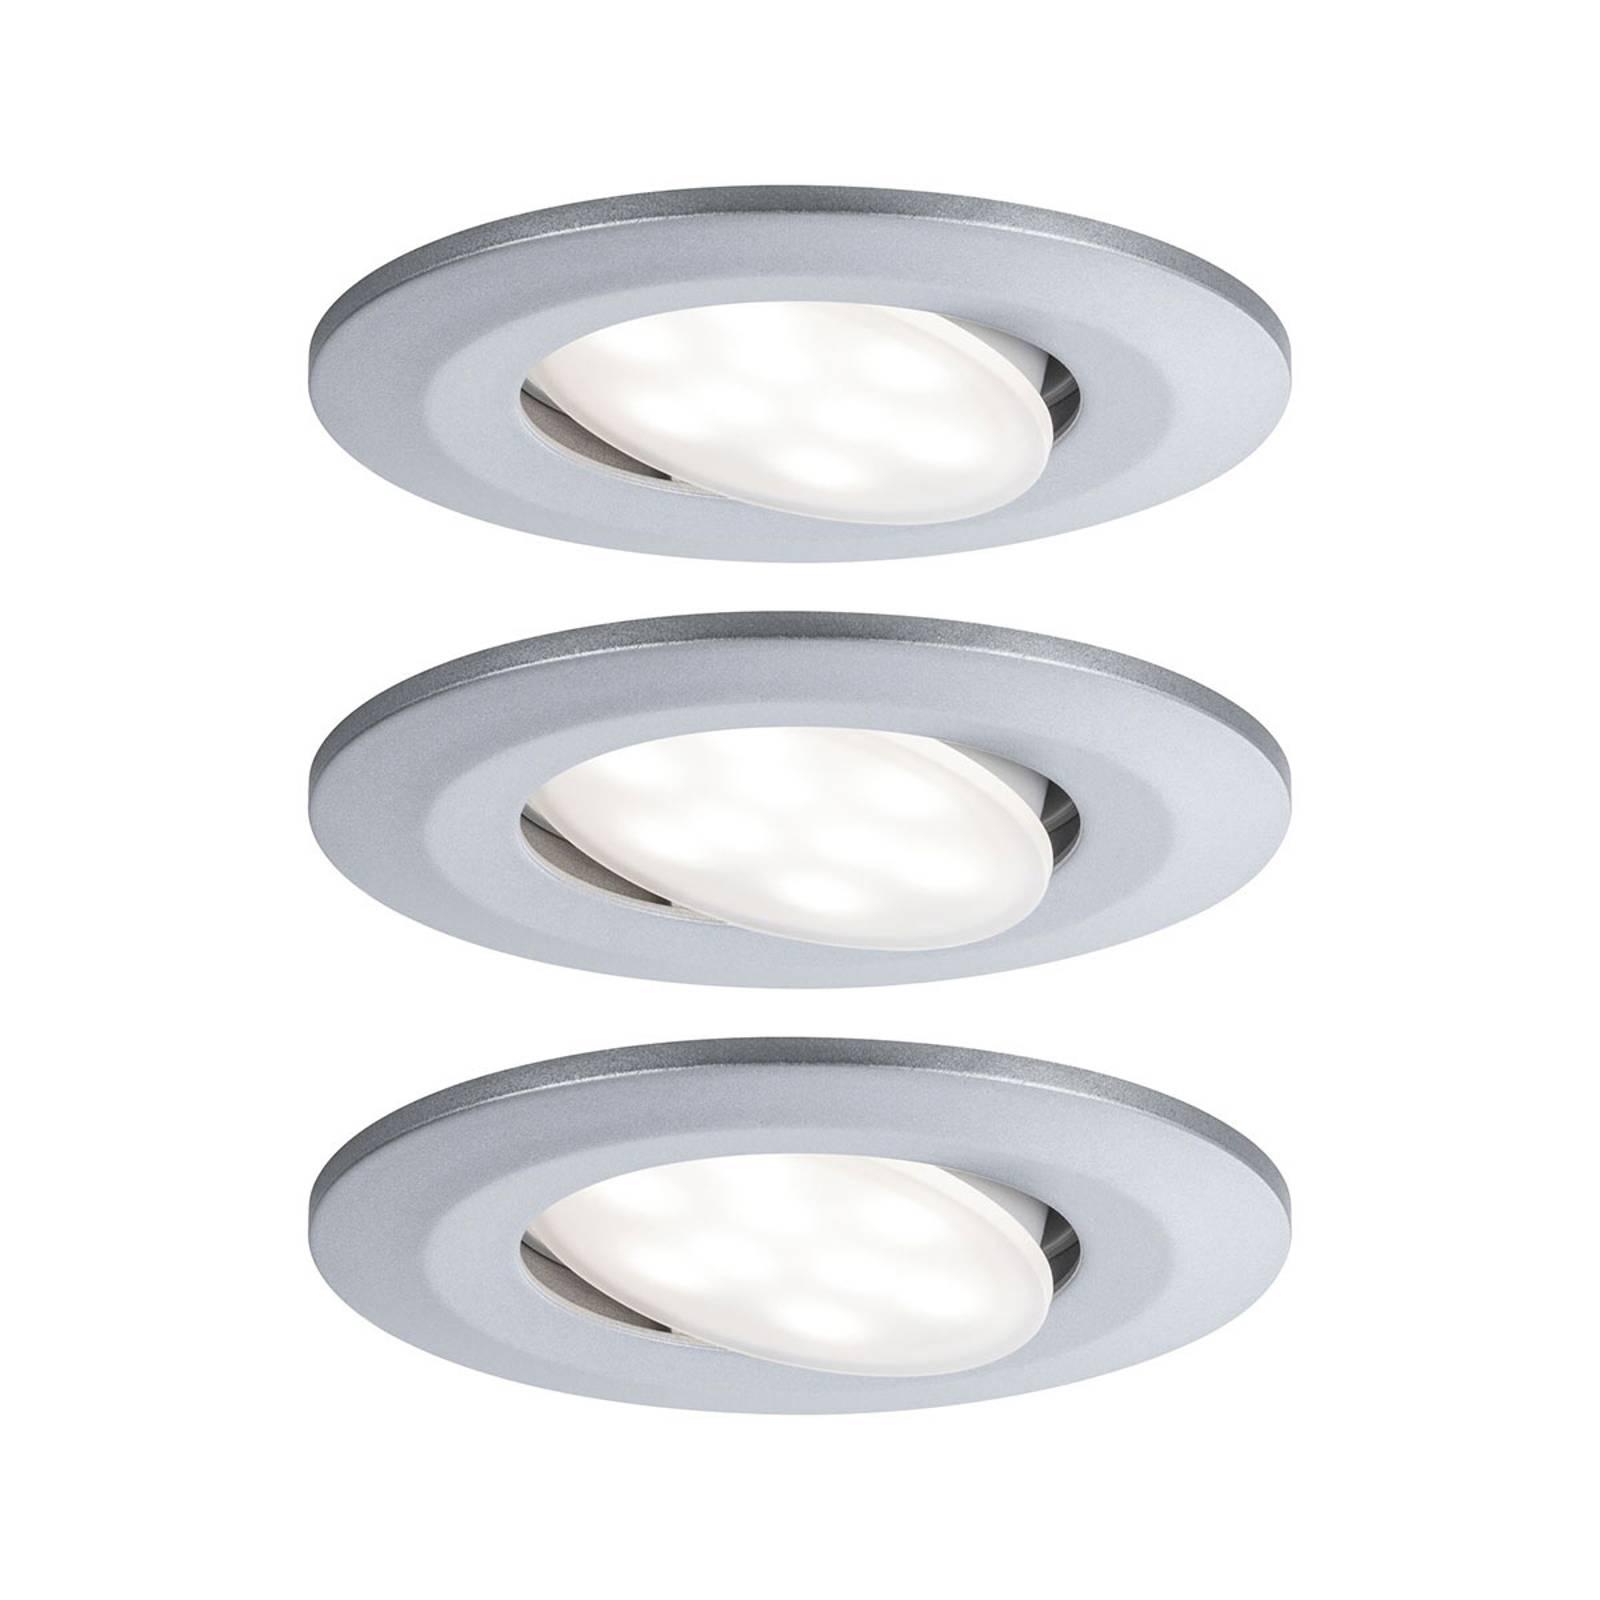 Paulmann LED buiten-inbouwspot Calla per 3, chroom